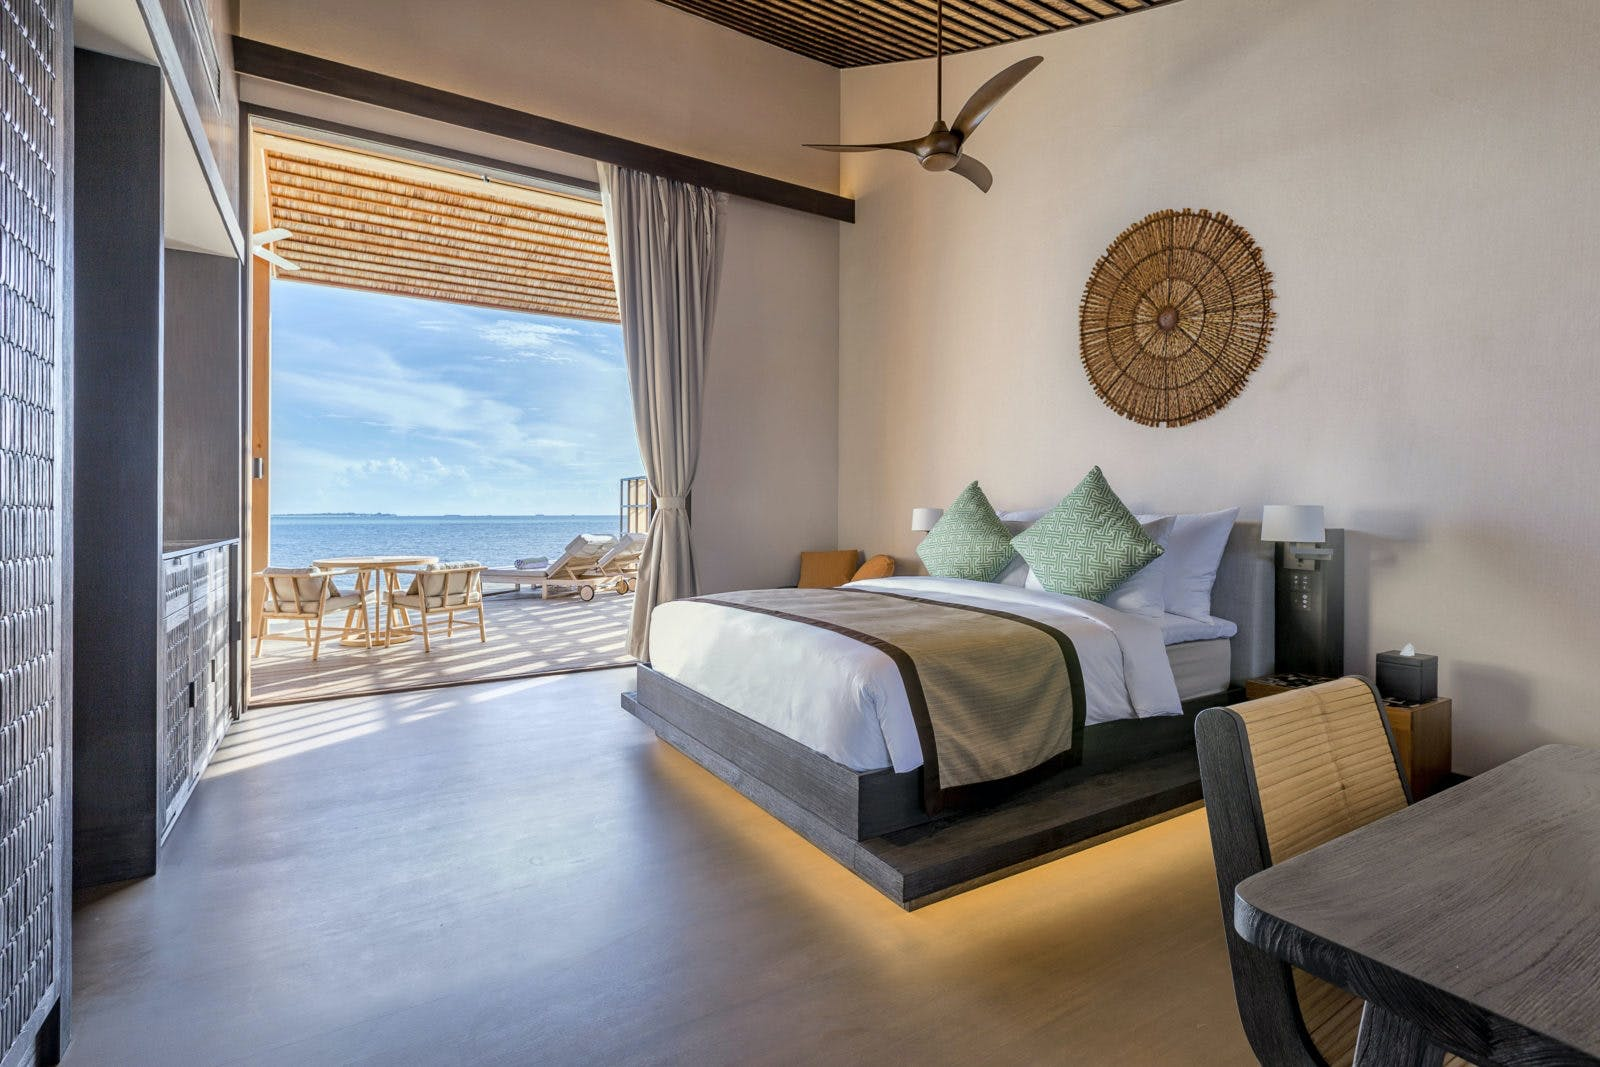 Maldiverne hotel soveværelse villa retreat